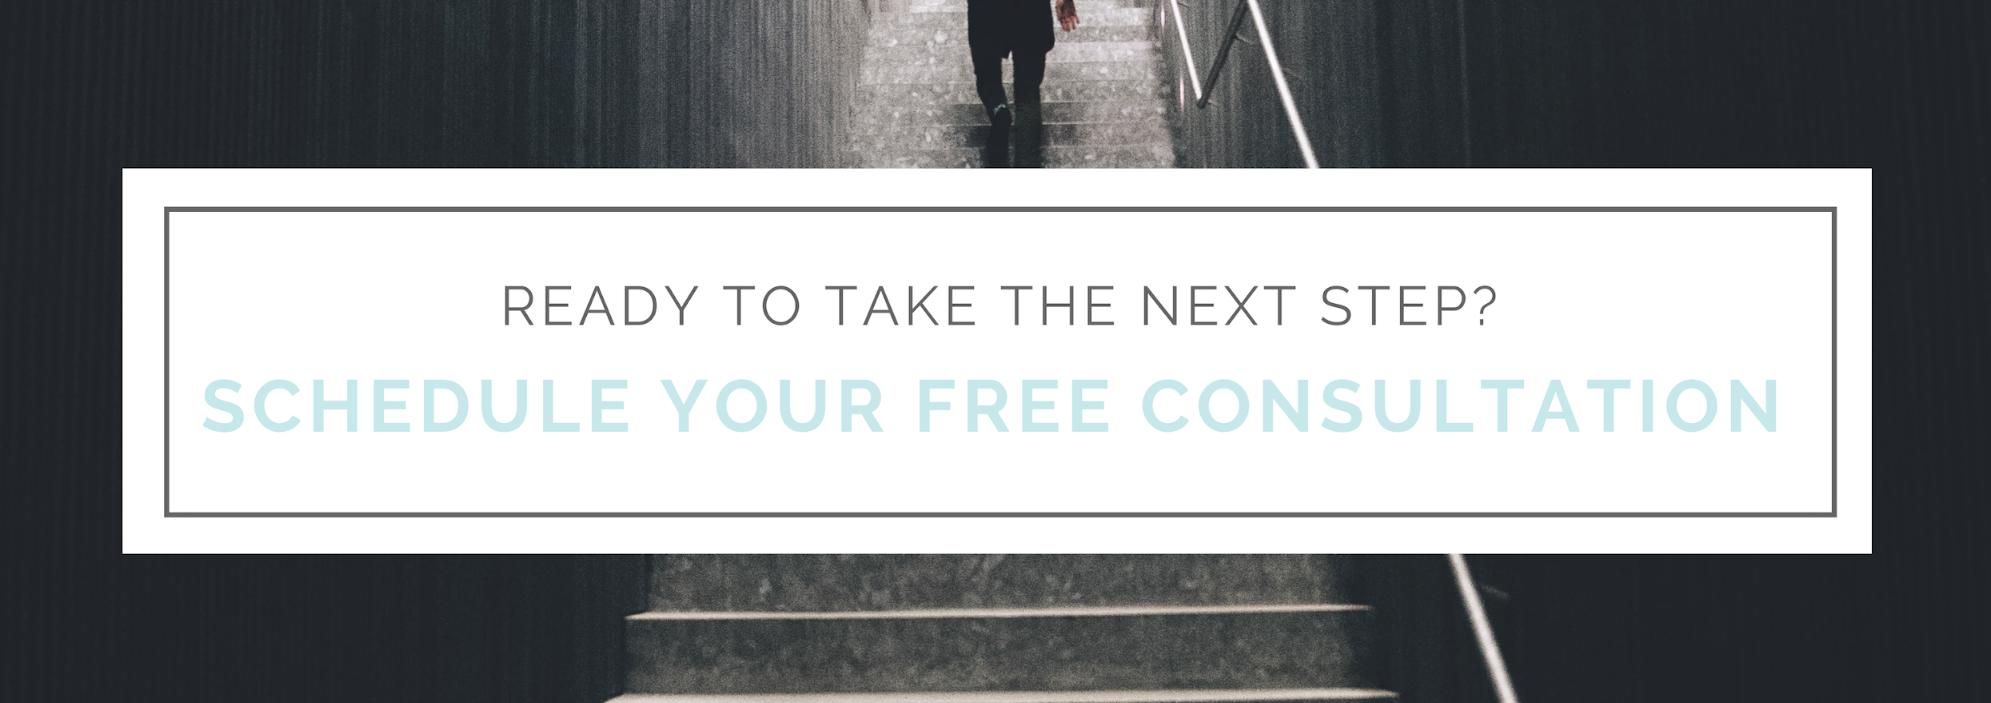 schedule free consultation